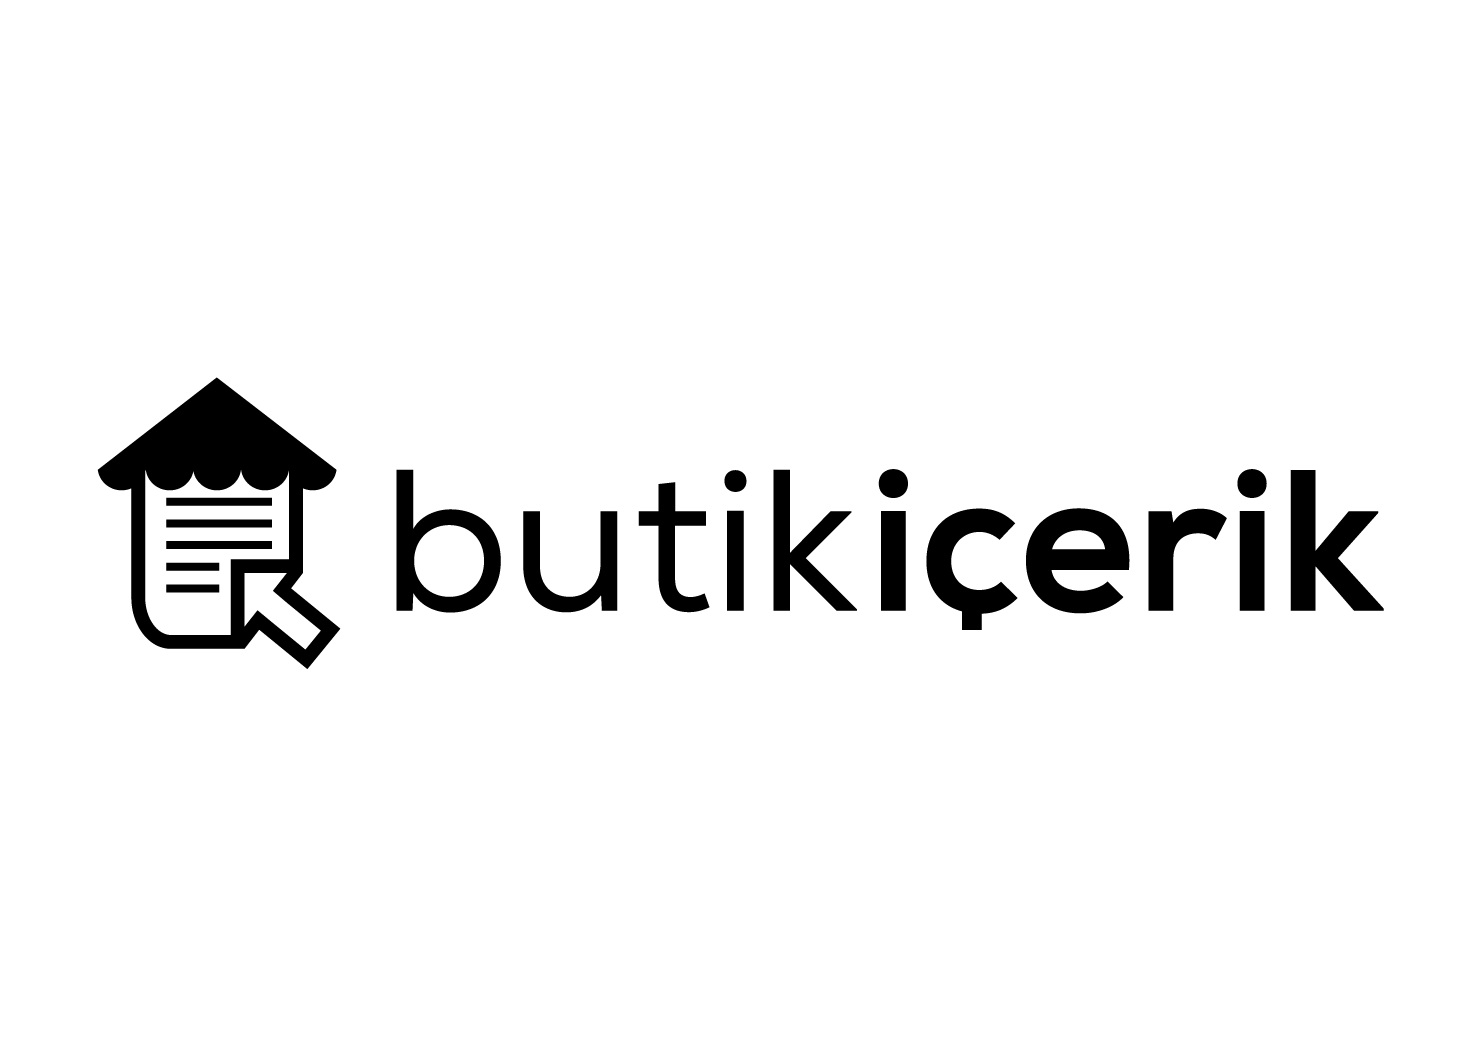 butikiçeriklogo